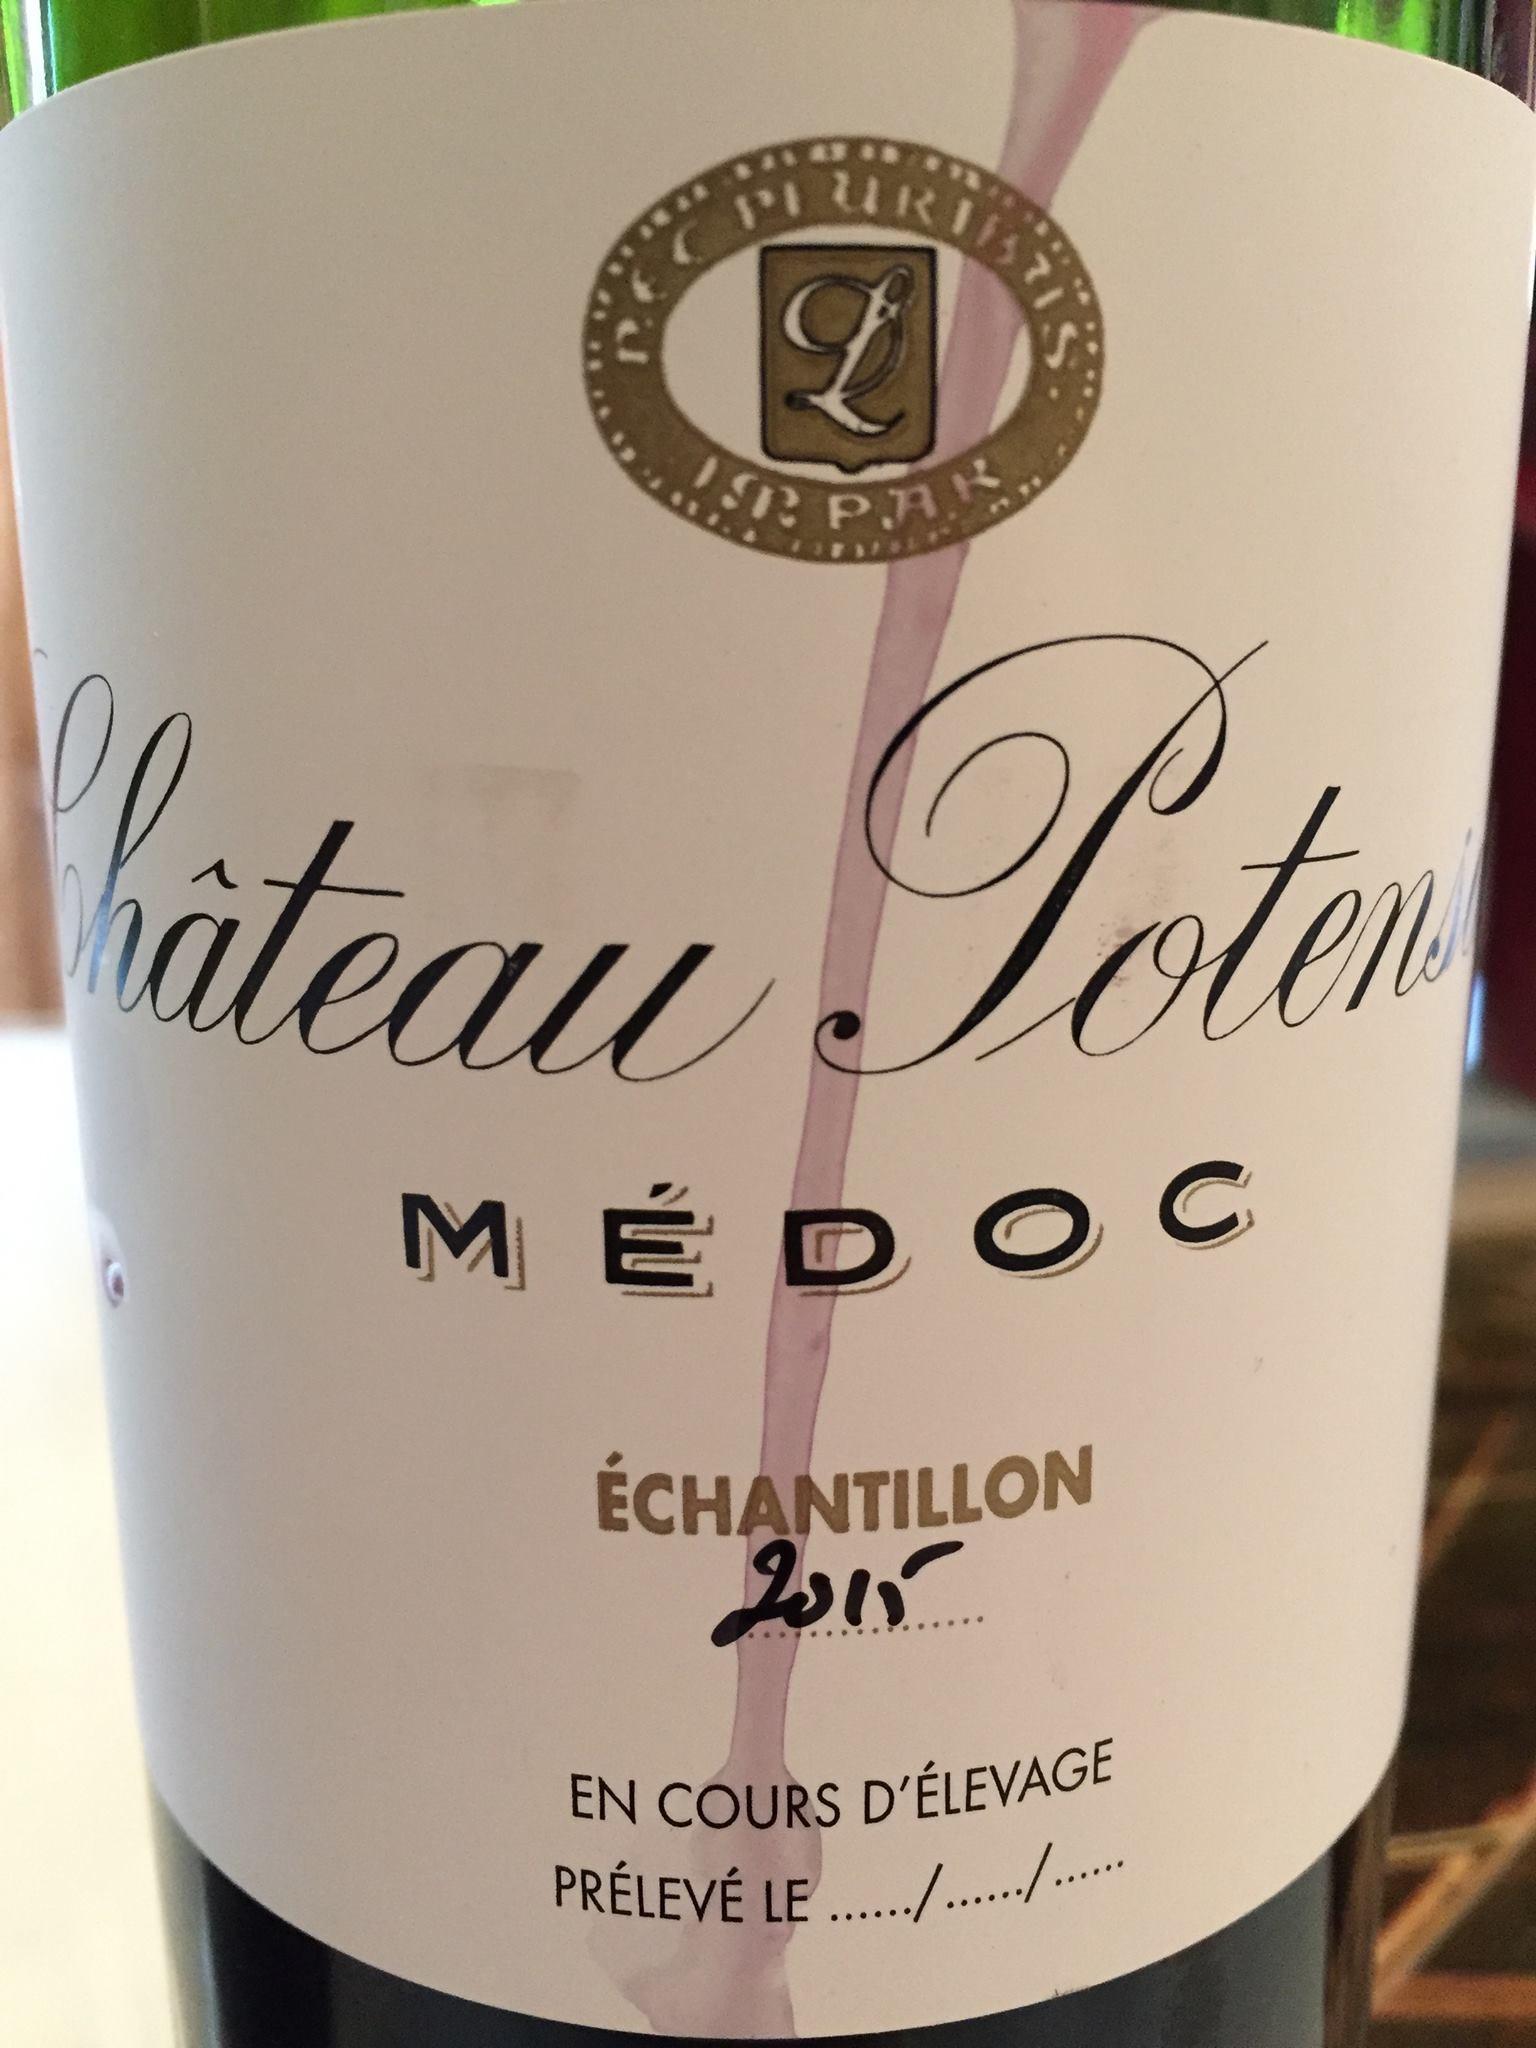 Château Potensac 2015 – Médoc